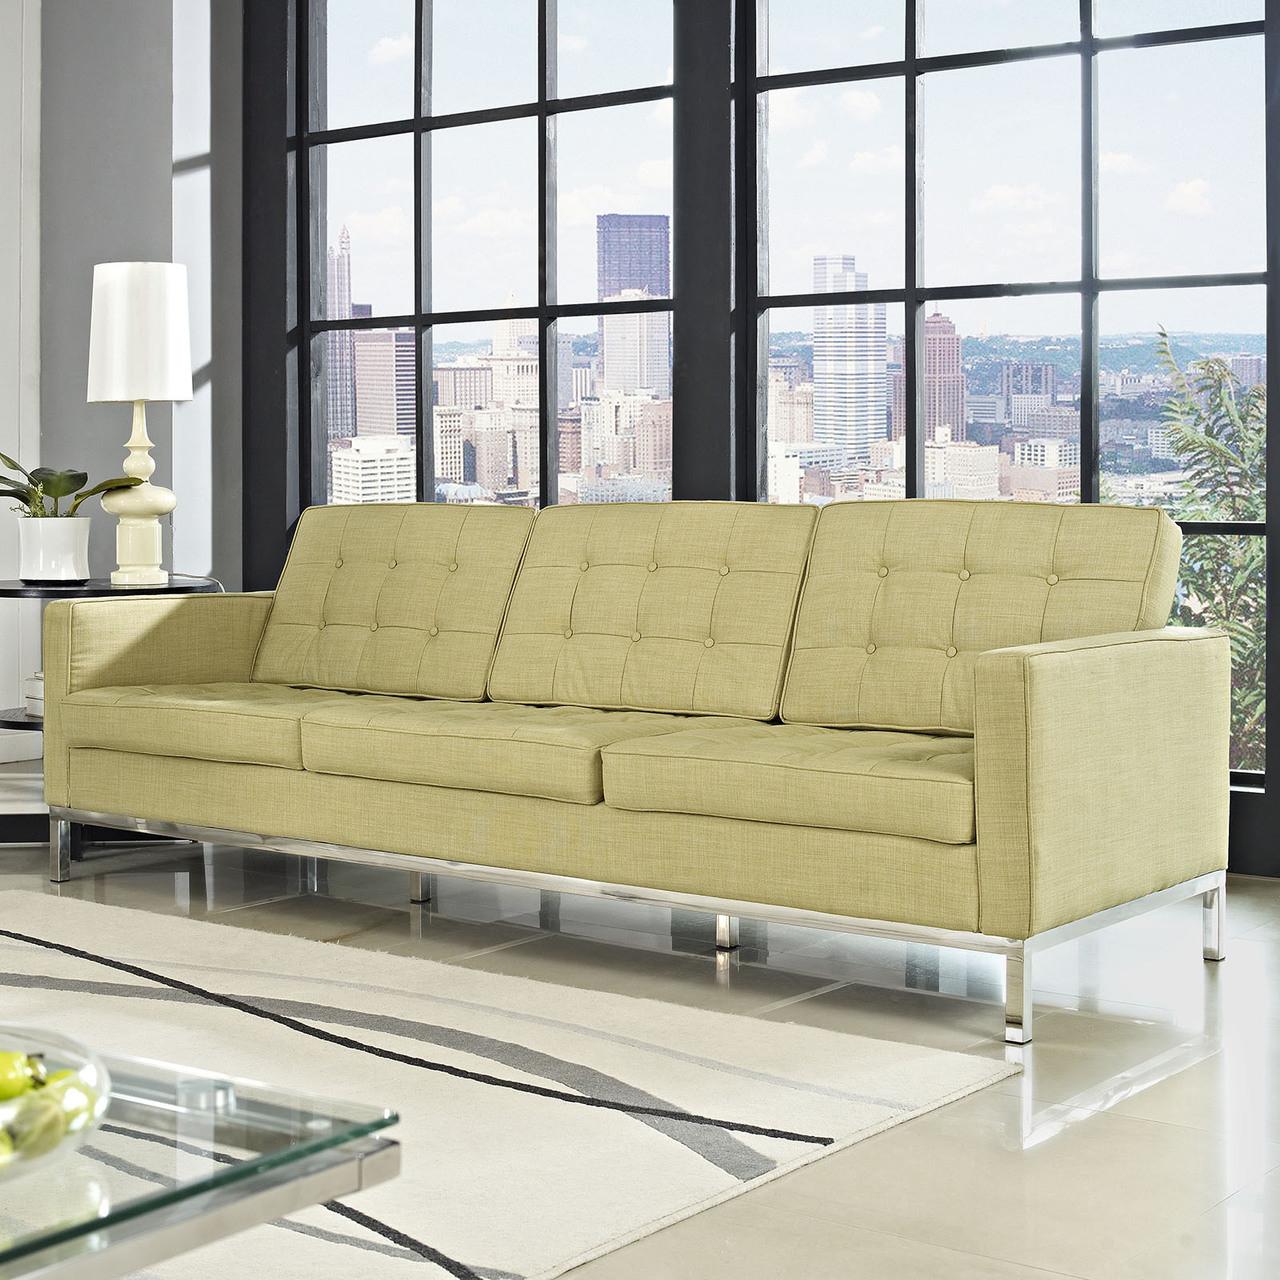 florence style wool loft sofa zin home. Black Bedroom Furniture Sets. Home Design Ideas